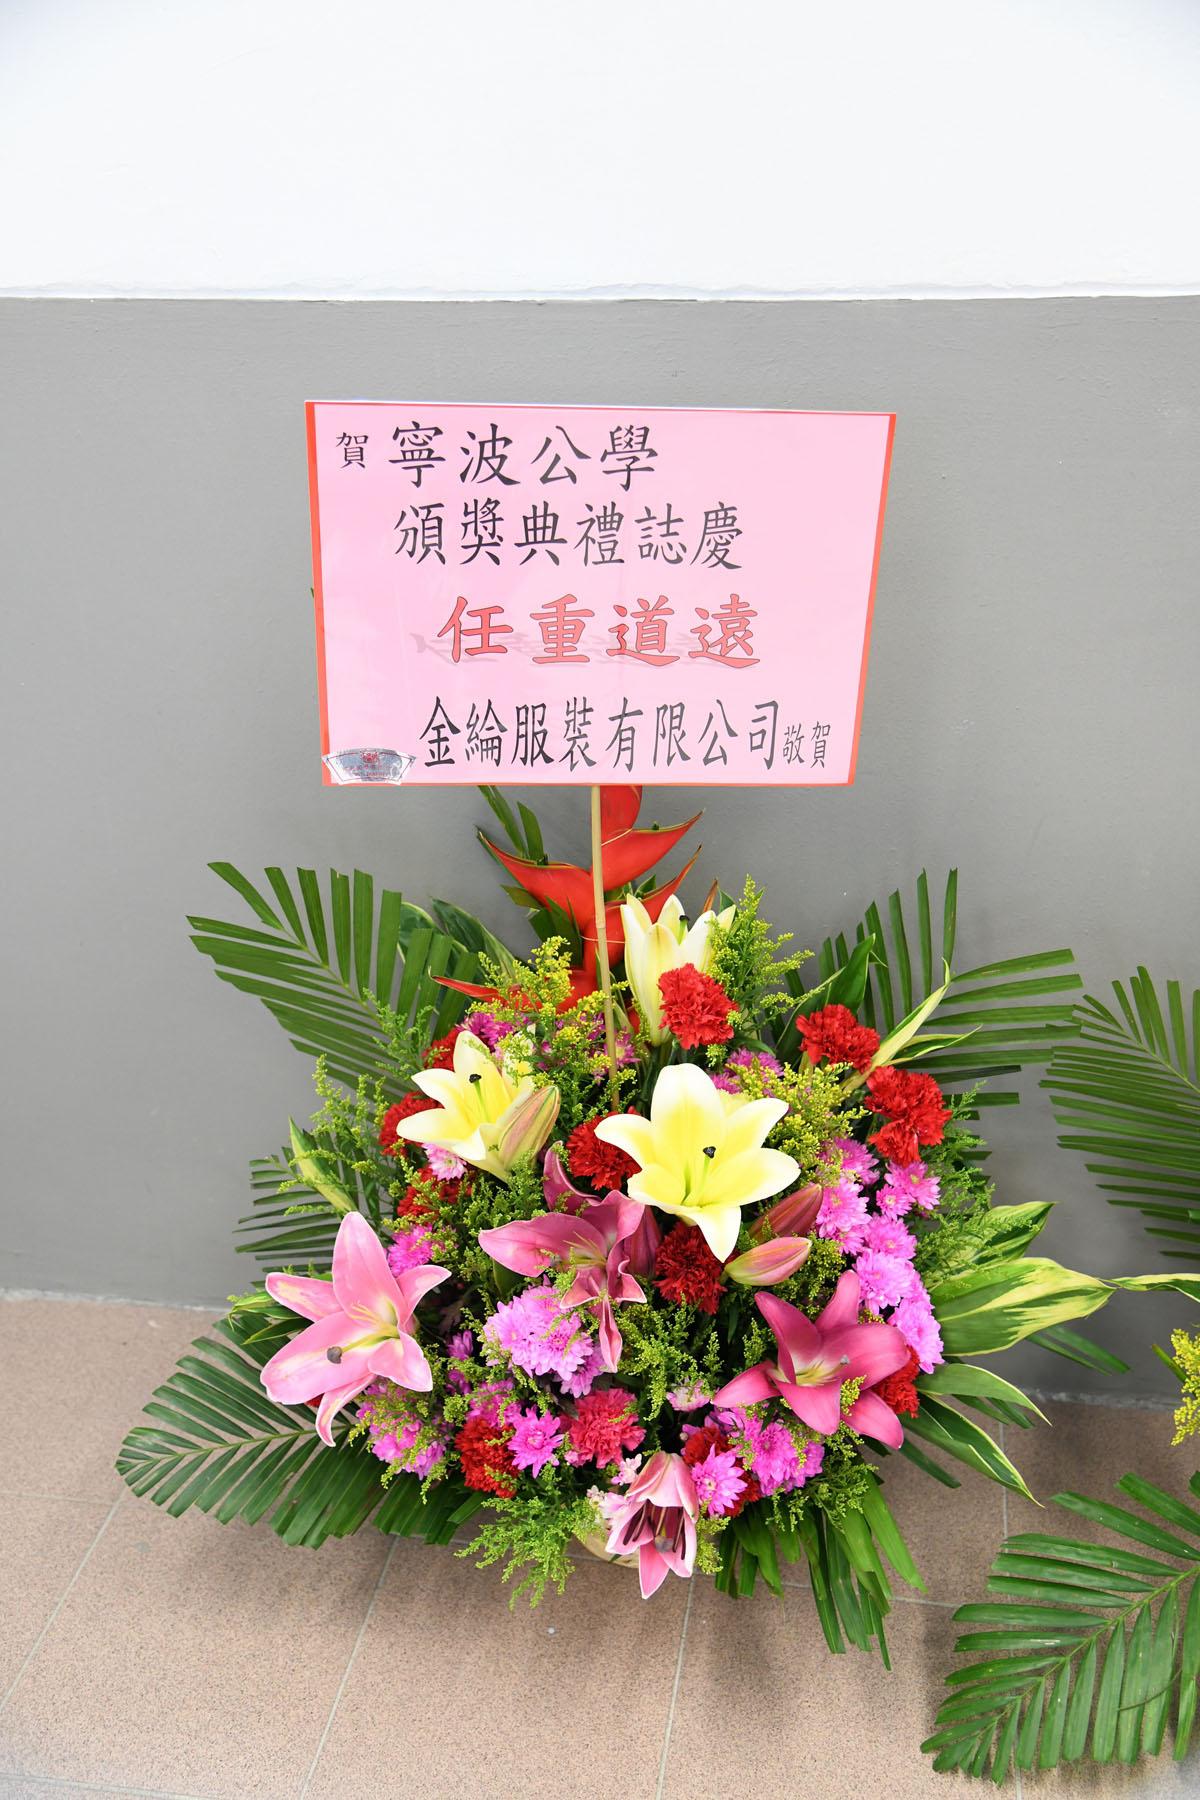 https://npc.edu.hk/sites/default/files/dsc_0234.jpg